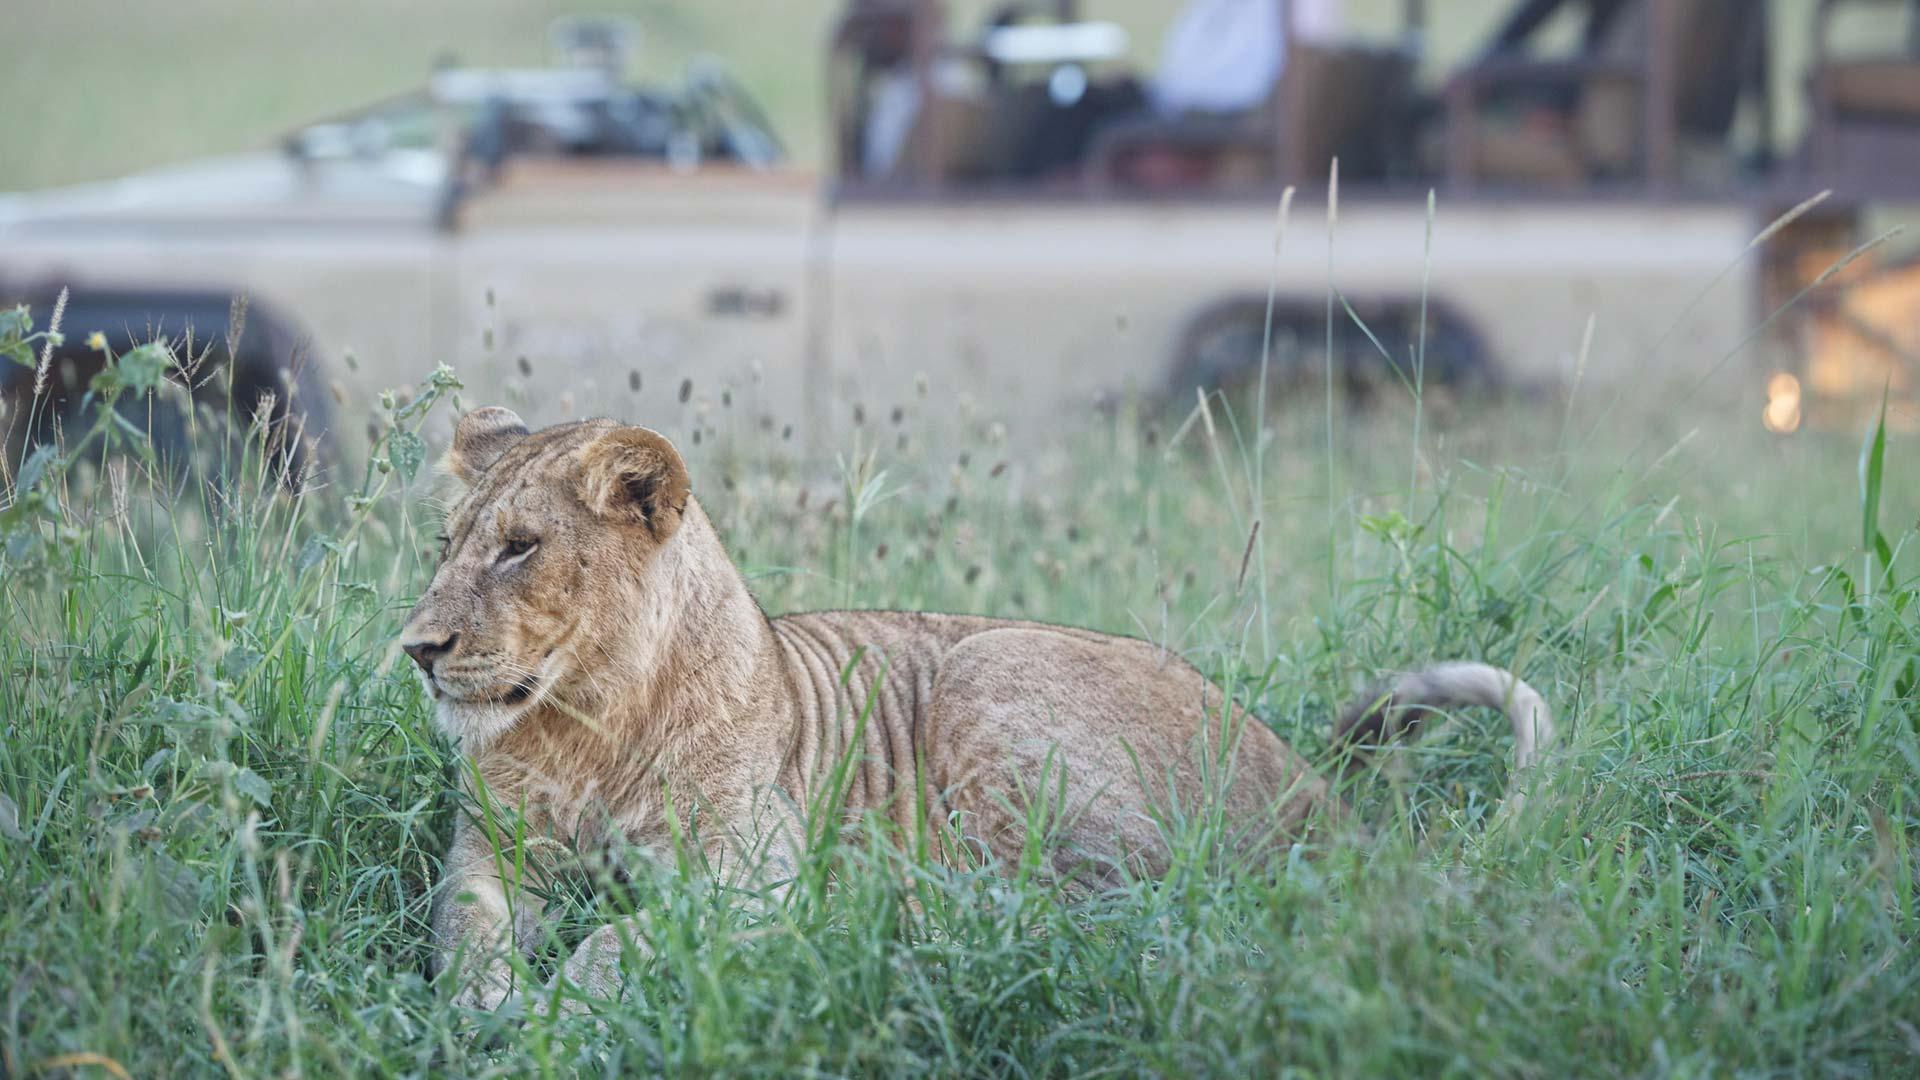 Lioness at Singita Sabora